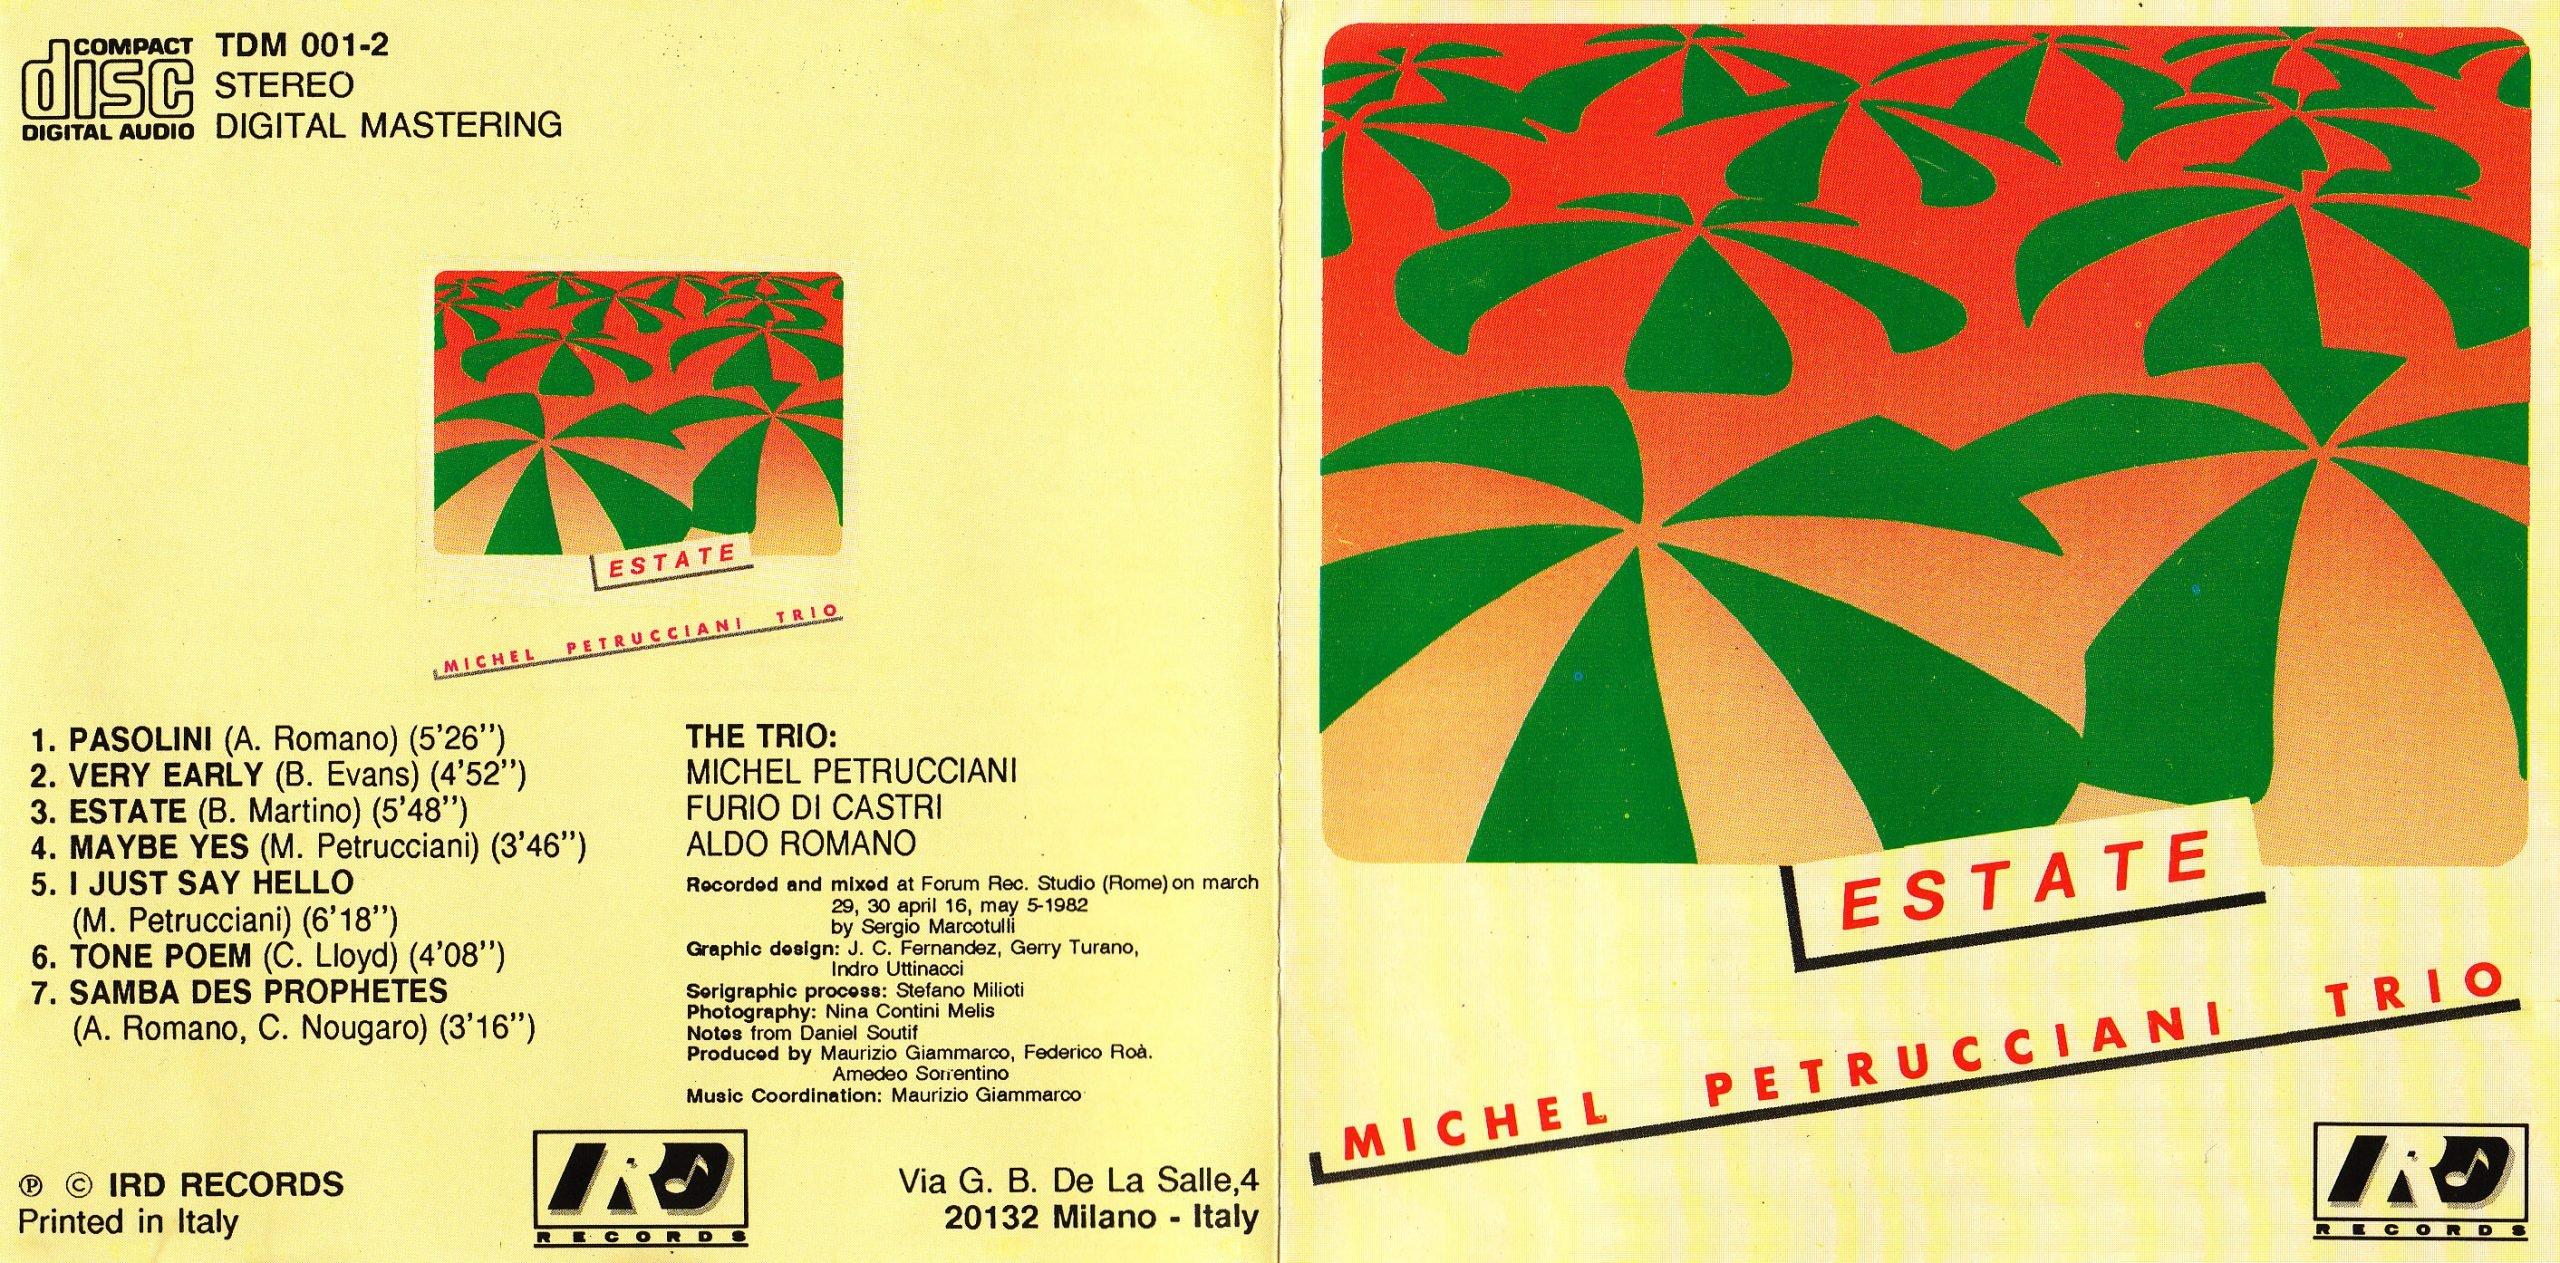 Estate - Michel Petrucciani booklet